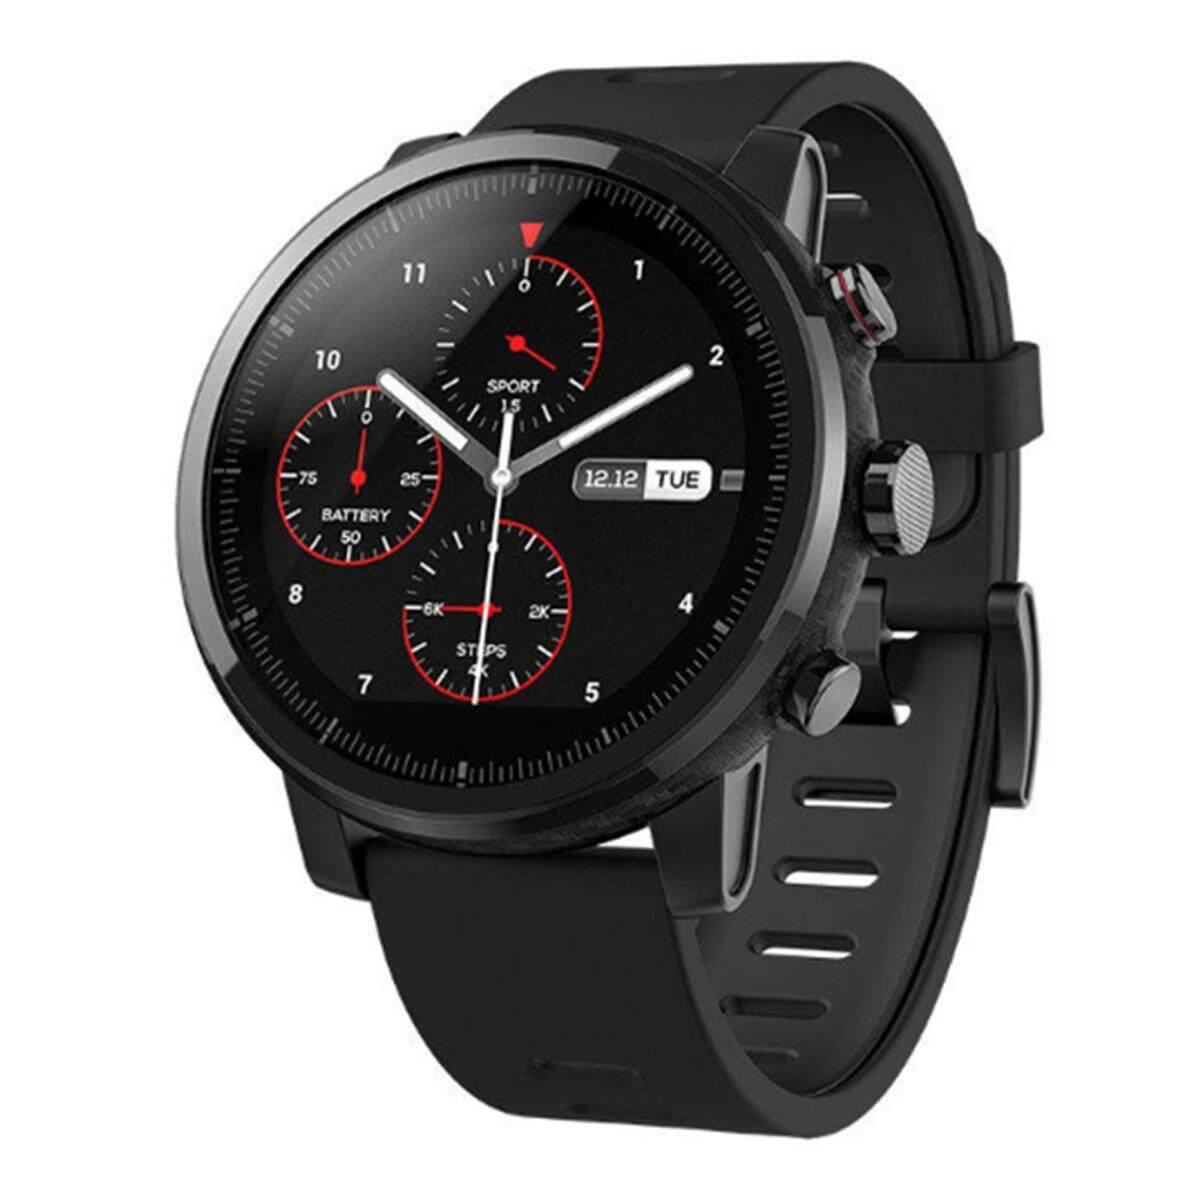 Xiaomi Huami Amazfit Stratos Kecepatan 2 Smartwatch-Hitam (Versi Bahasa Inggris)-Intl